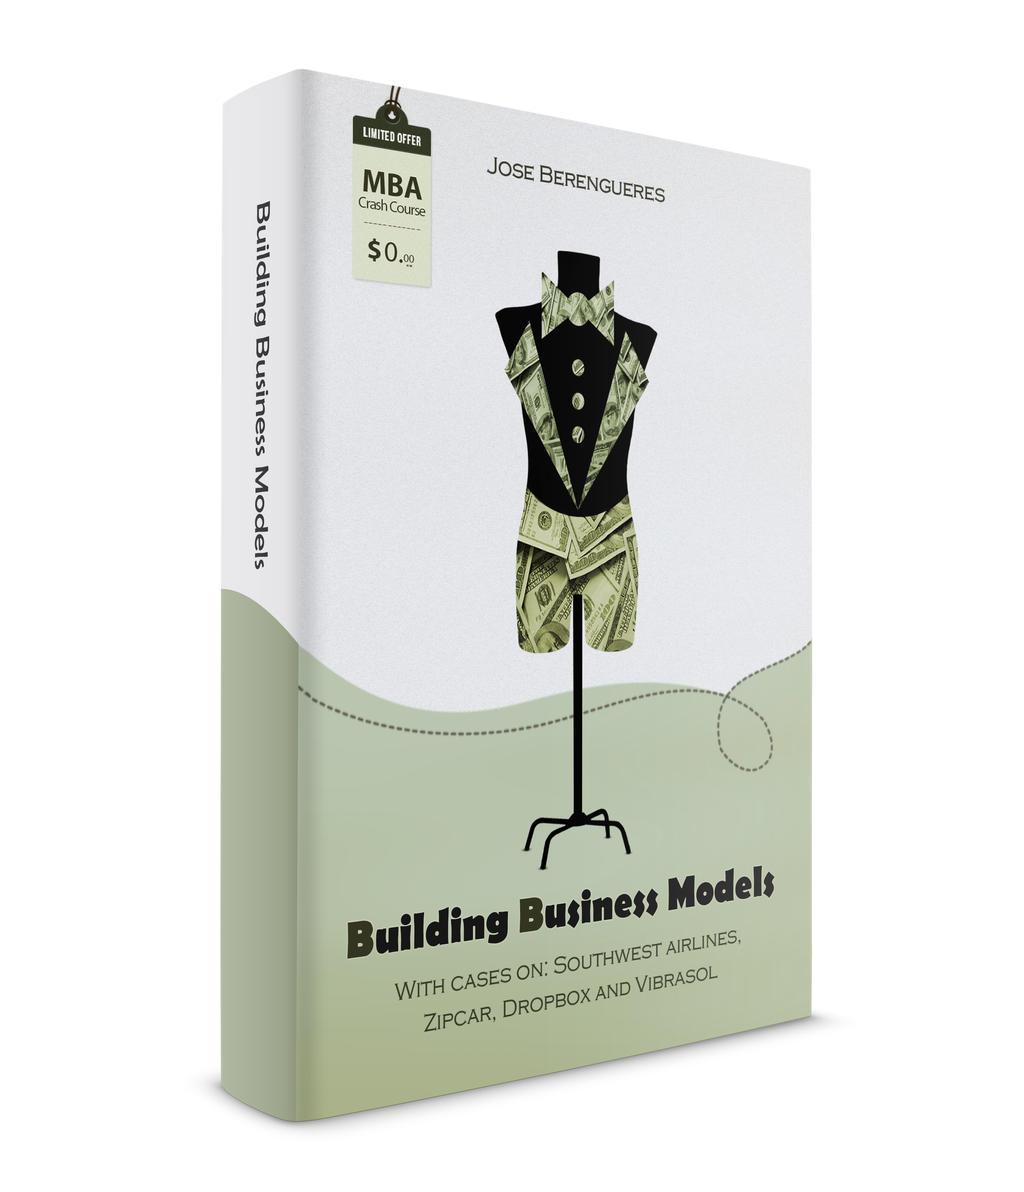 BBM JOSE Book